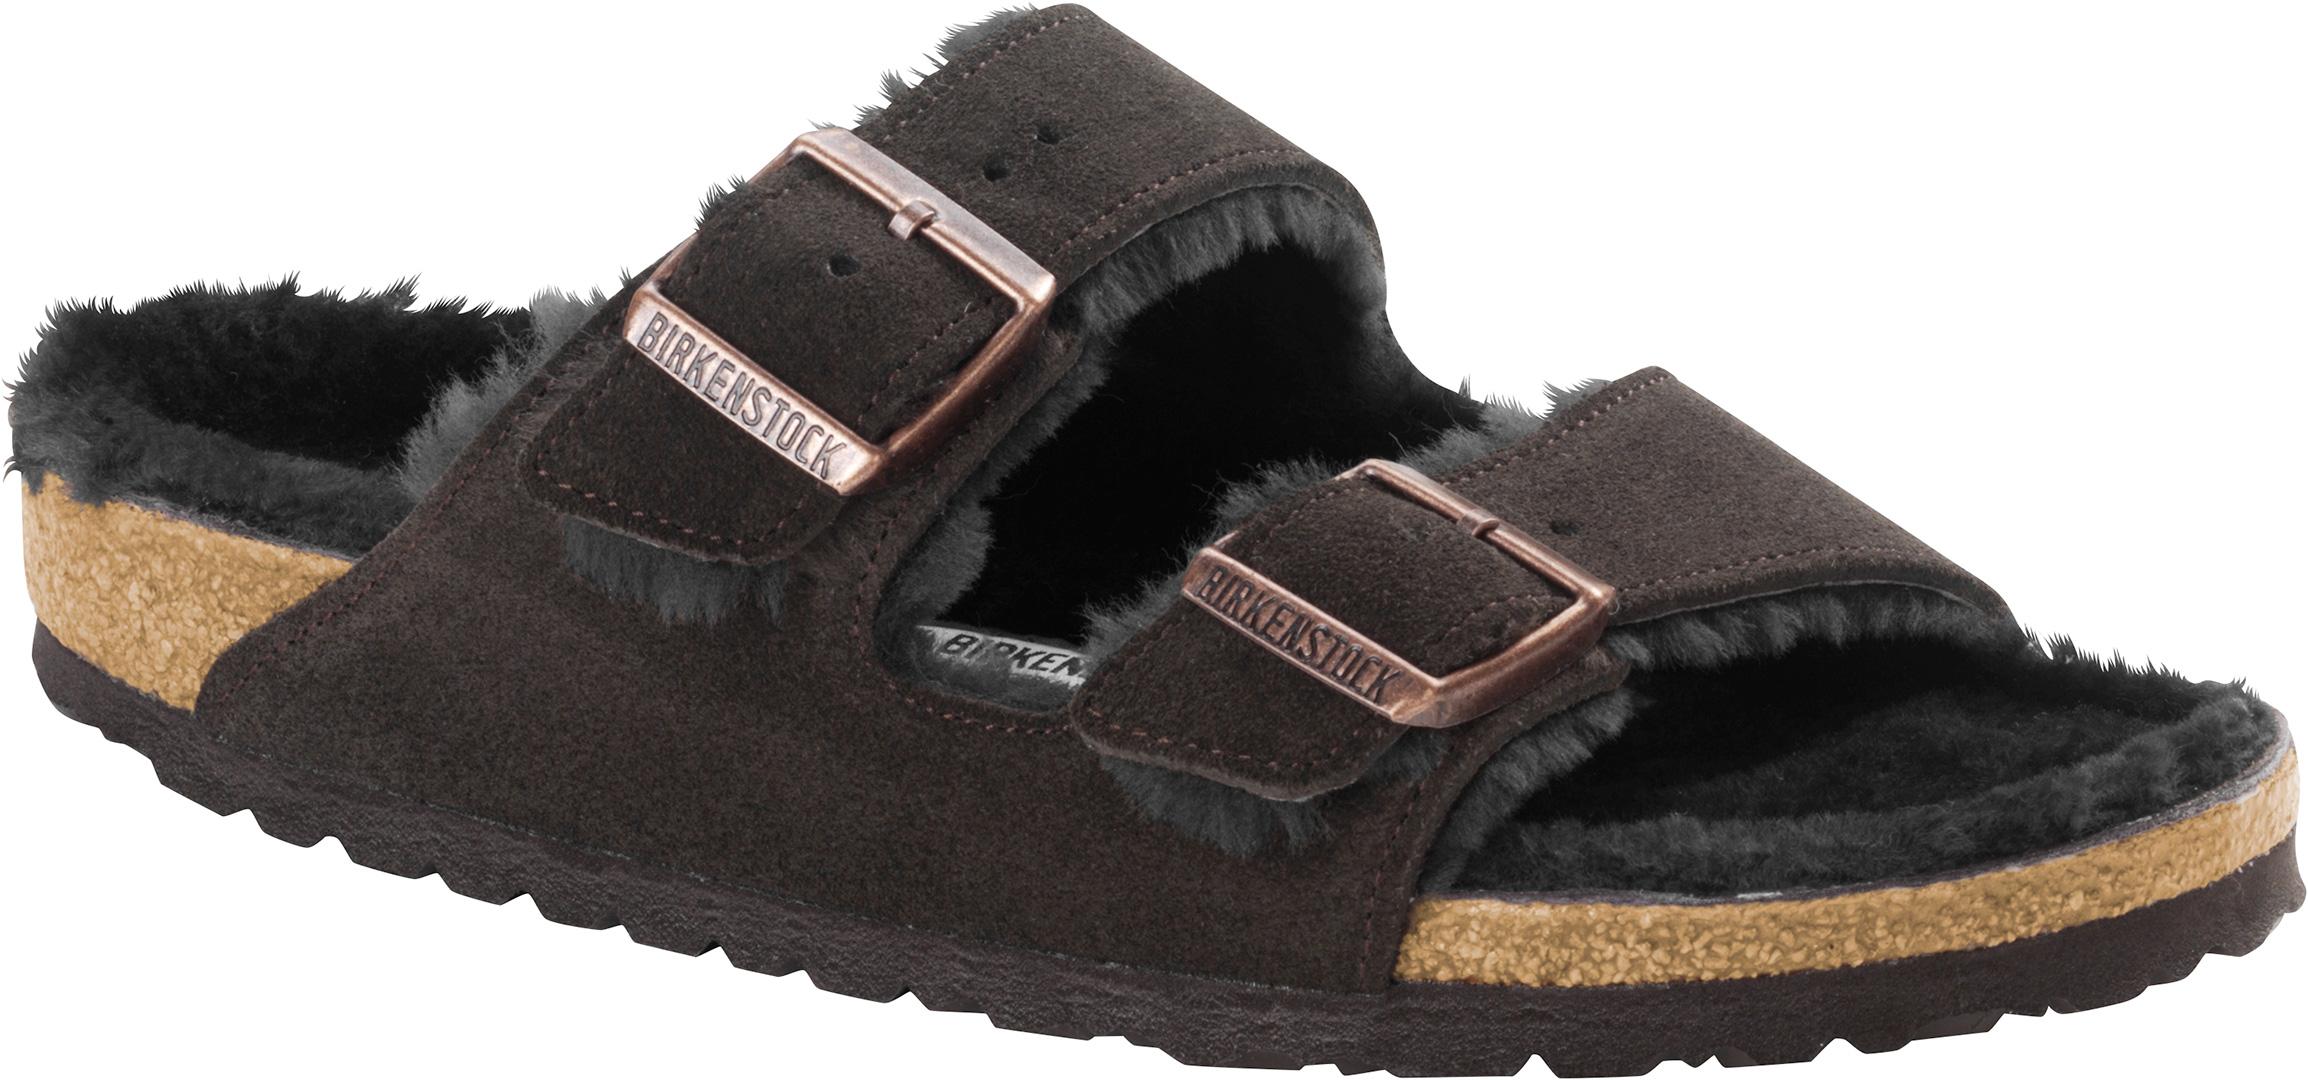 Birkenstock ARIZONA Slap FELL Sandale 2018 mocca/mocca Sandale Slap ARIZONA Badeschuhe Schuhe 400d24